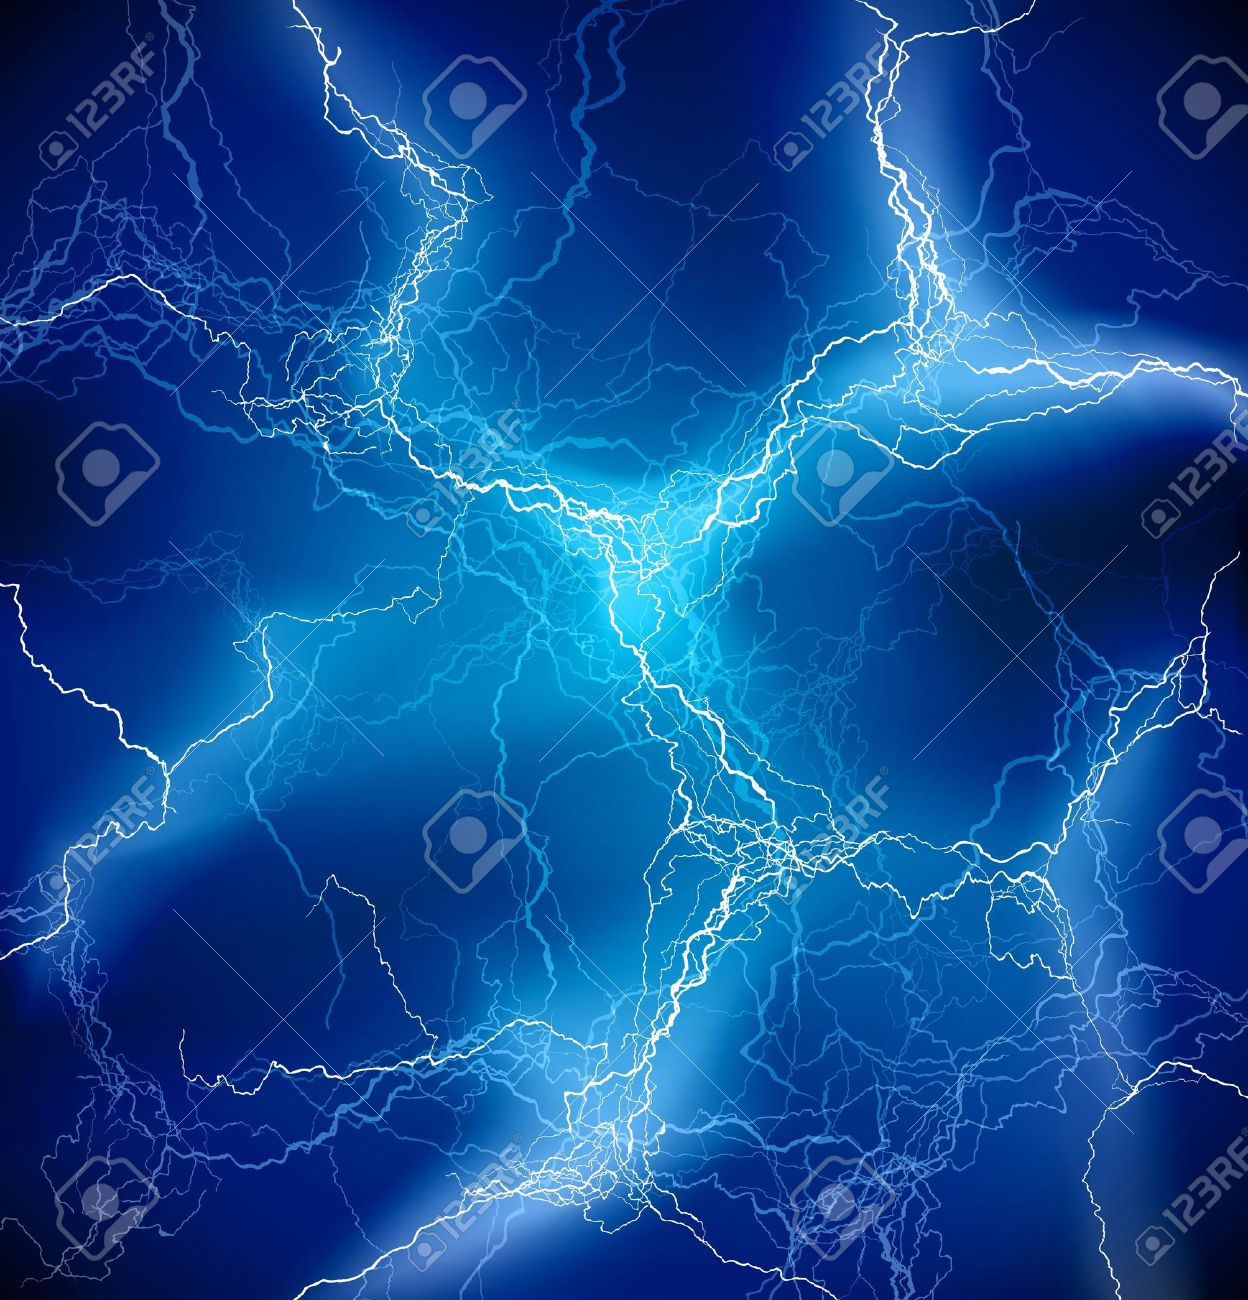 Vector Blue Lighting storm background Stock Vector - 12807600